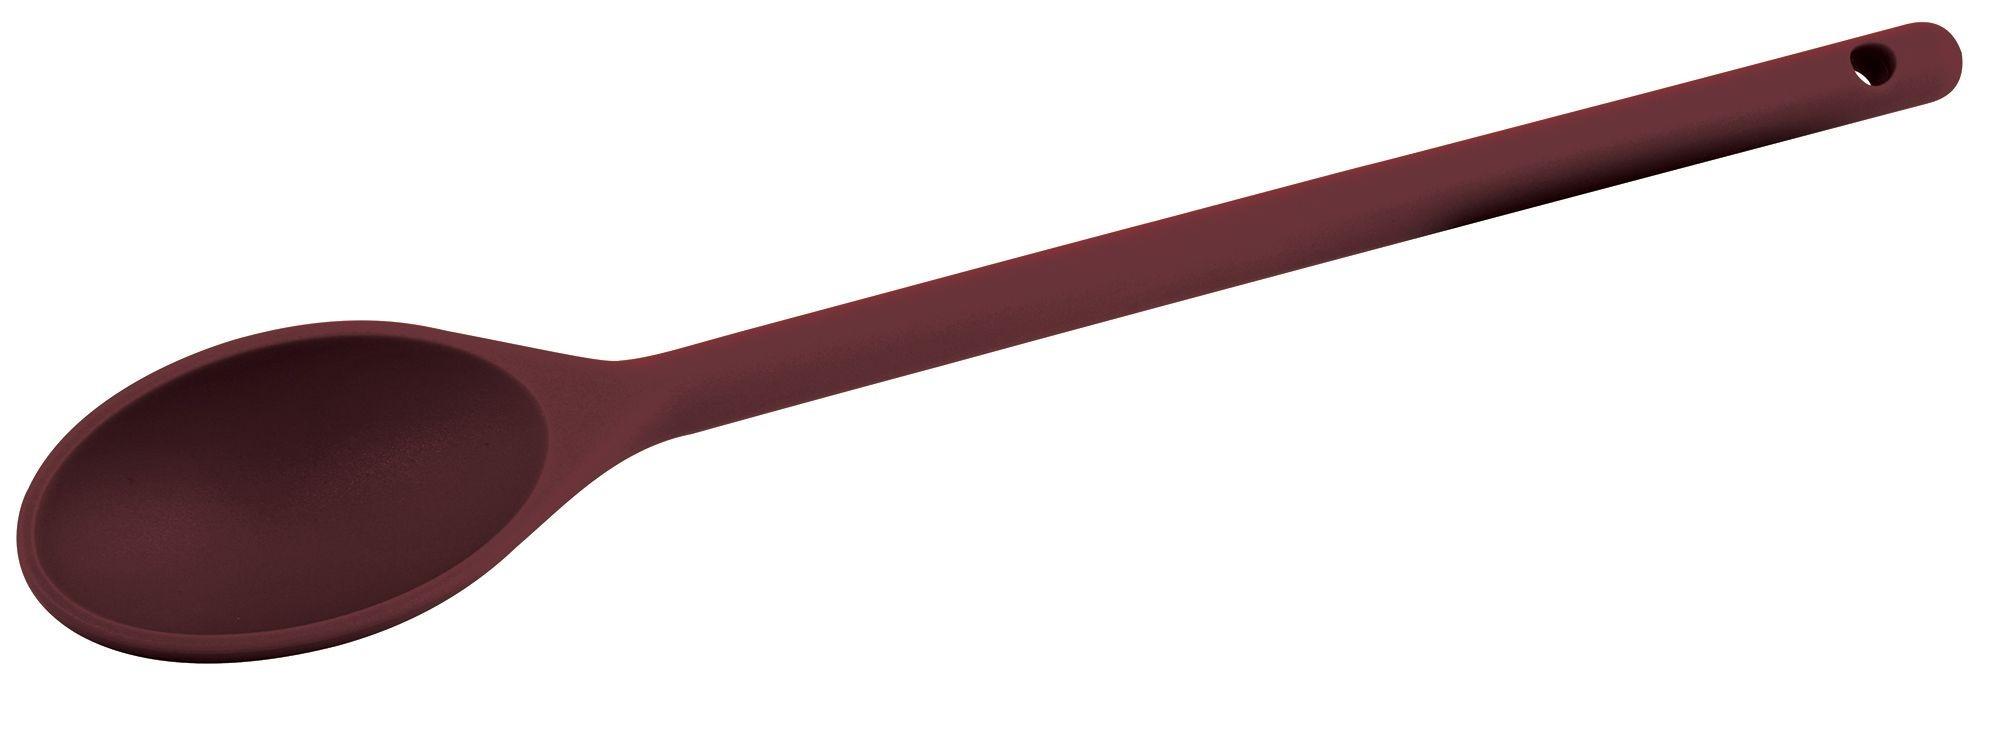 "Winco NS-12R Red Nylon Heat Resistant Spoon, 12"""